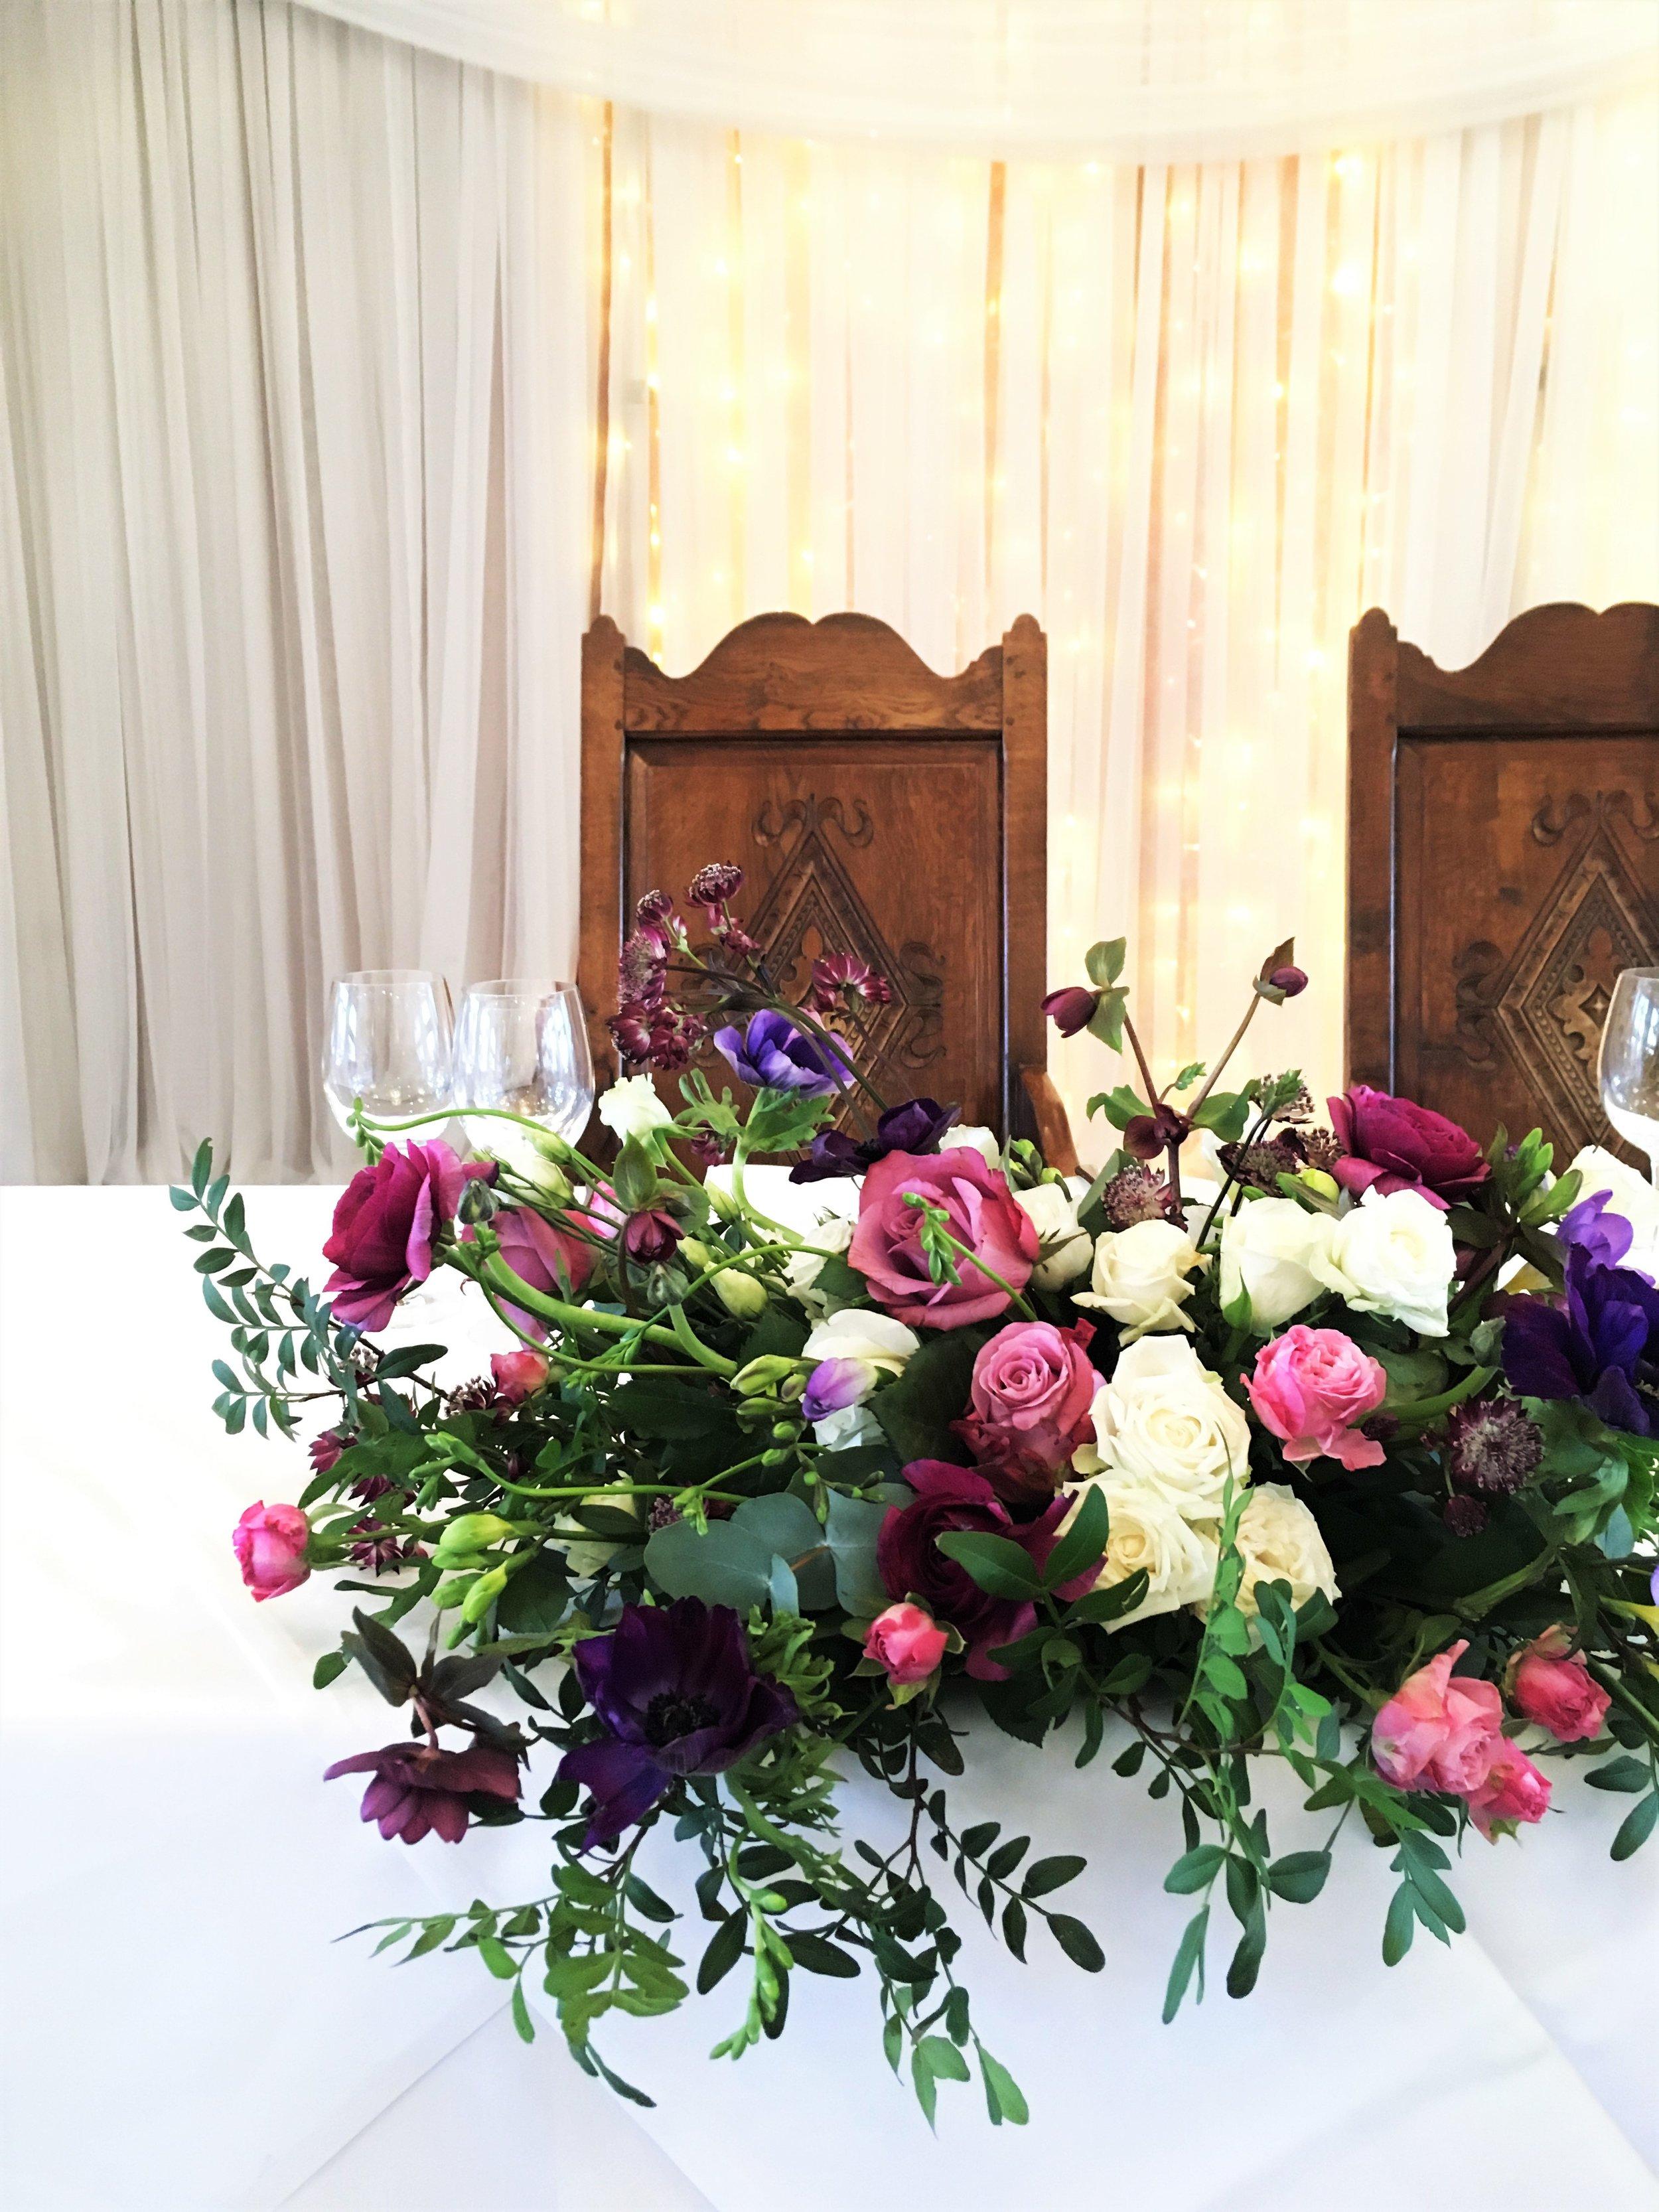 Webb-and-Farrer-Florist-Brighton-Sussex-Wedding-Flowers (20).JPG